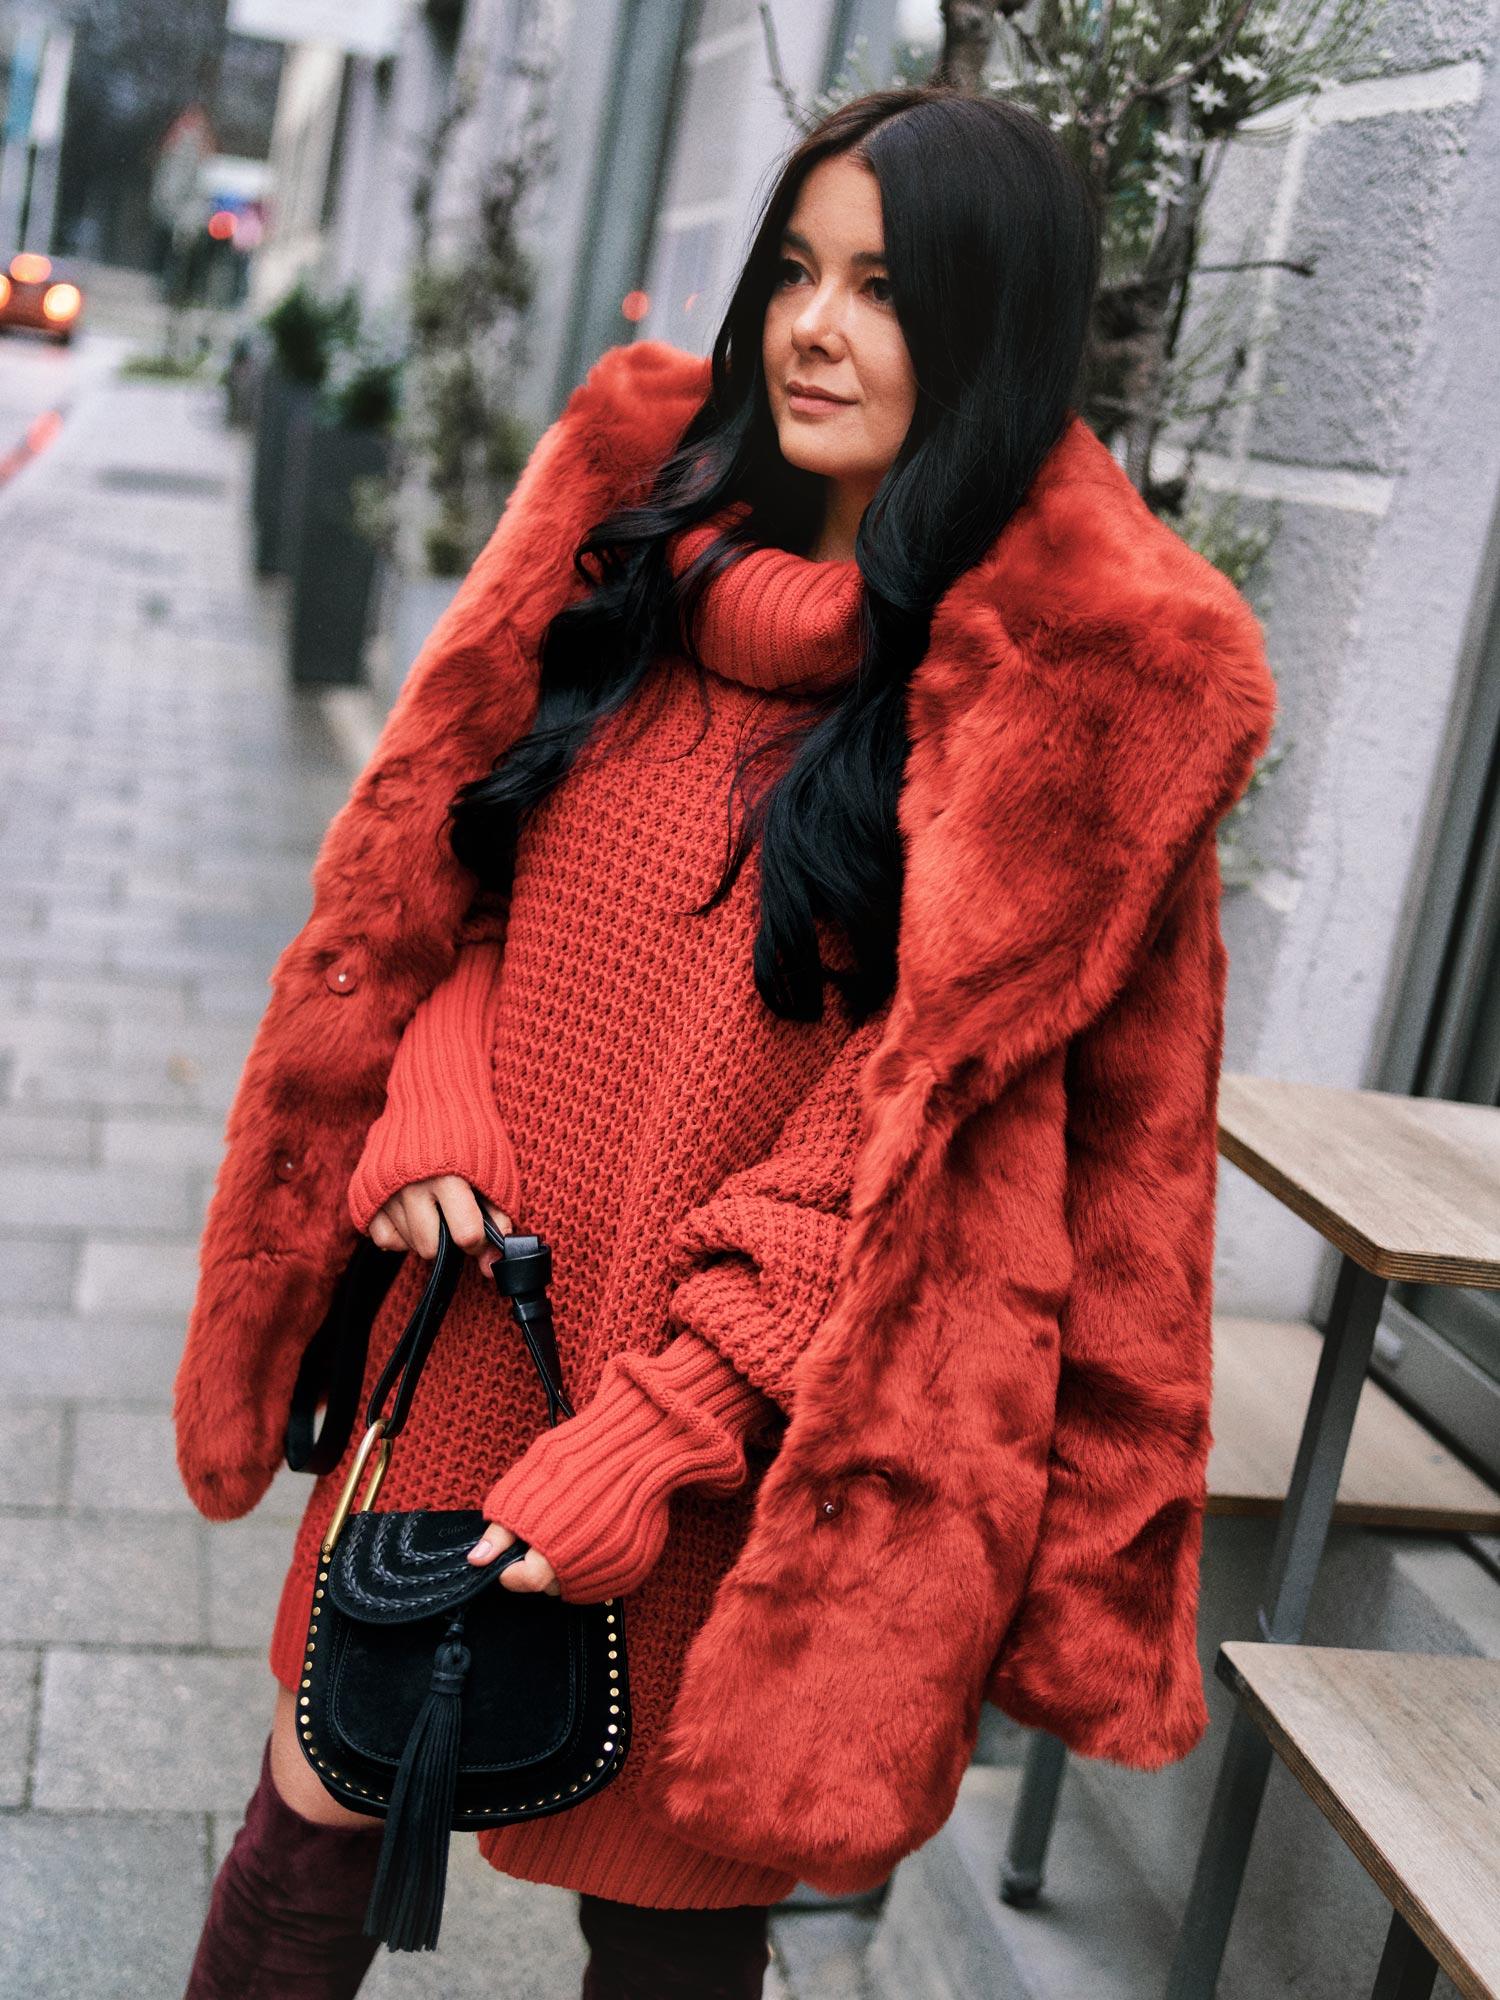 fashion-blogger-aus-muenchen-fashionblogger-lifestyleblogger-beautyblogger-fashion-blogger-modeblogger-modeblog-munich-blog-muenchen-trendfarben-2018-rot